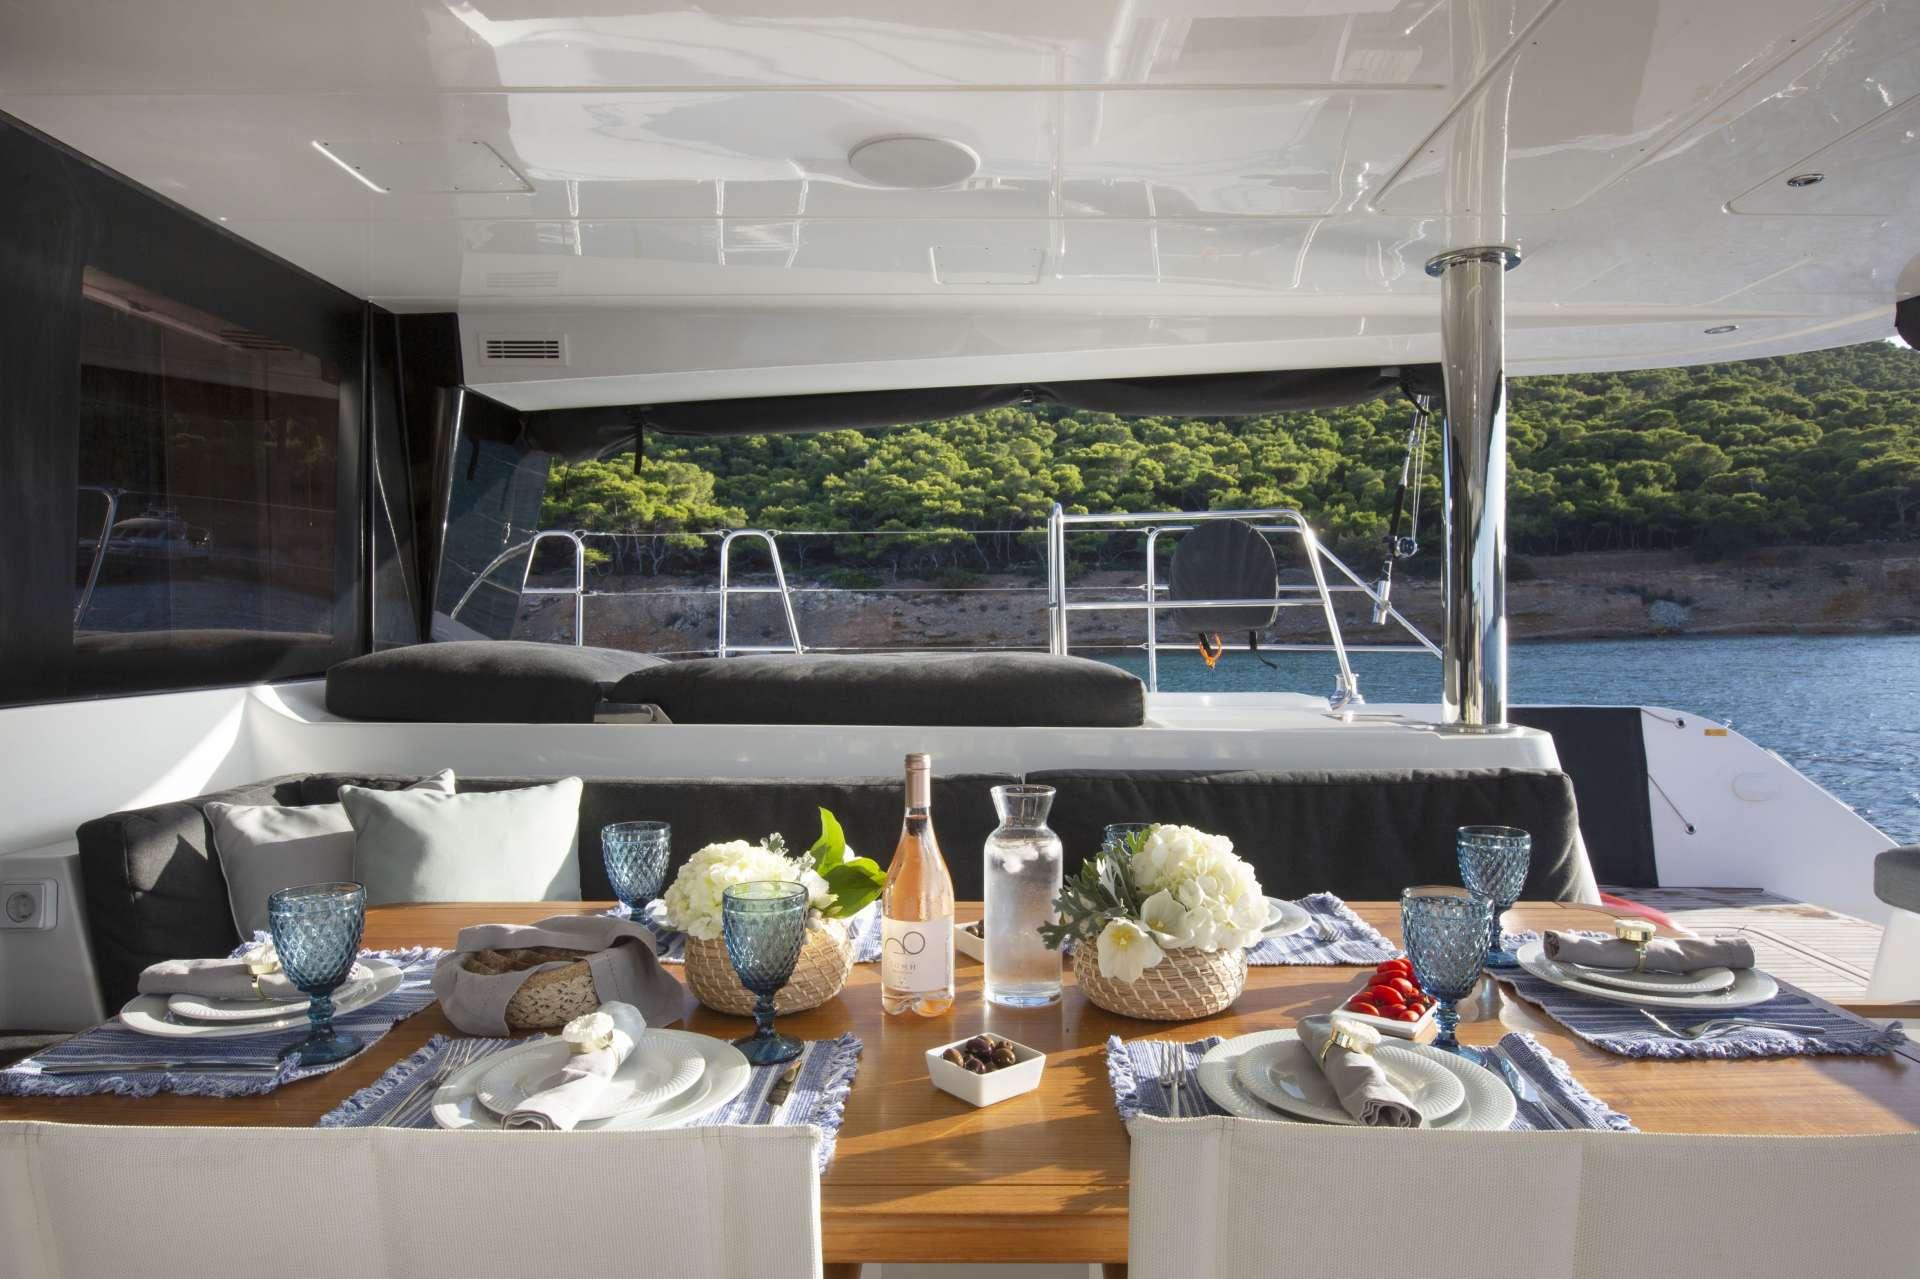 Cat Yacht 'Cat', 10 PAX, 3 Crew, 62.00 Ft, 18.00 Meters, Built 2019, Lagoon, Refit Year